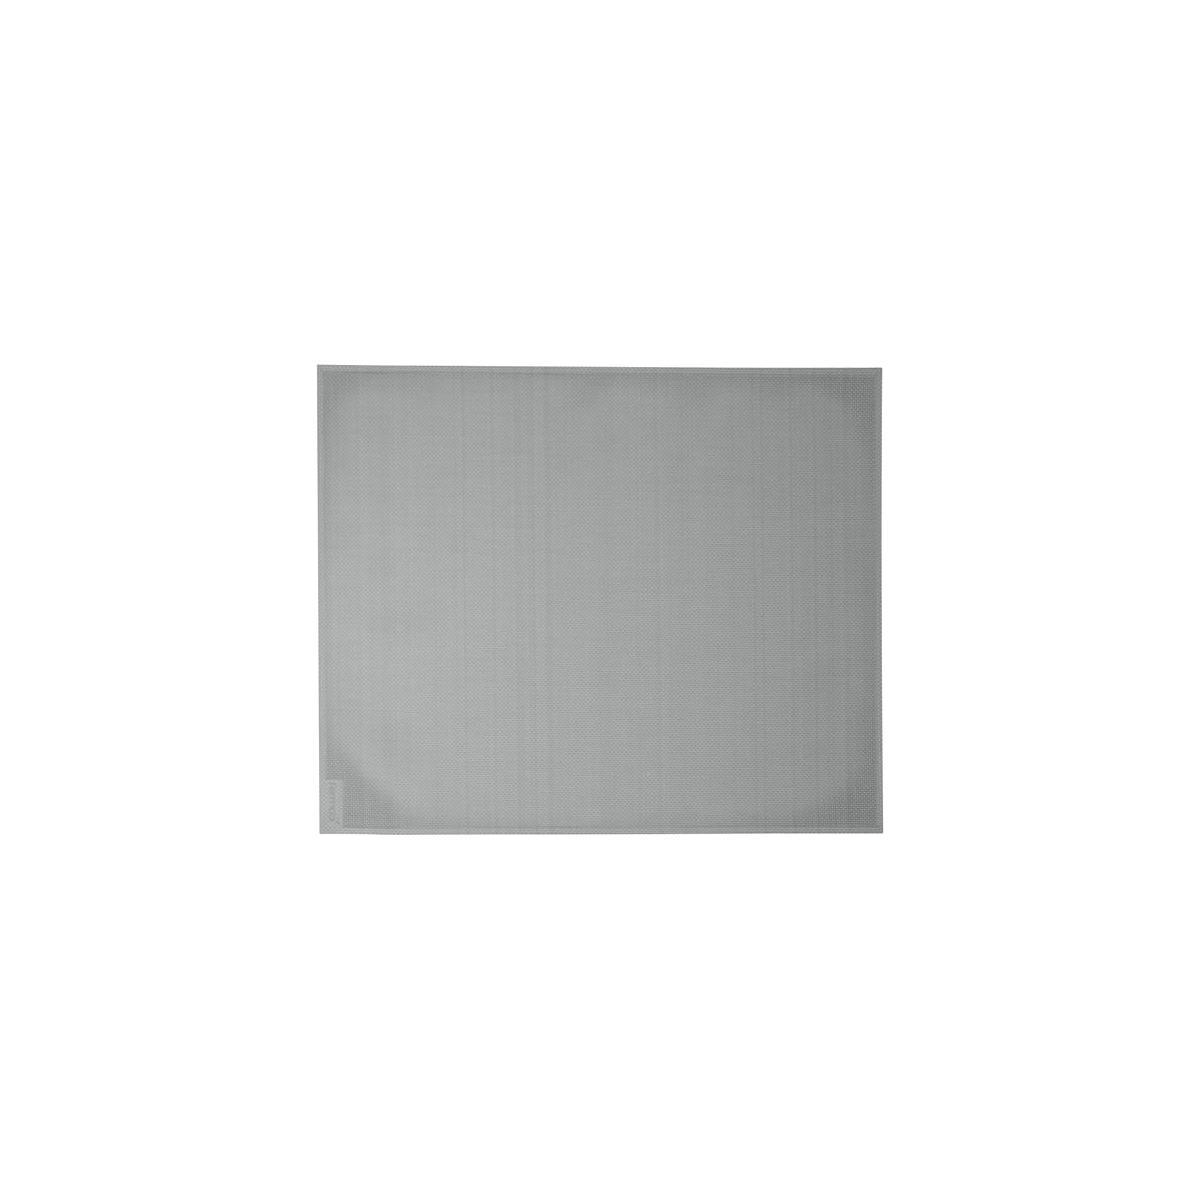 Set de Table LES BASICS Fermob Gris métal